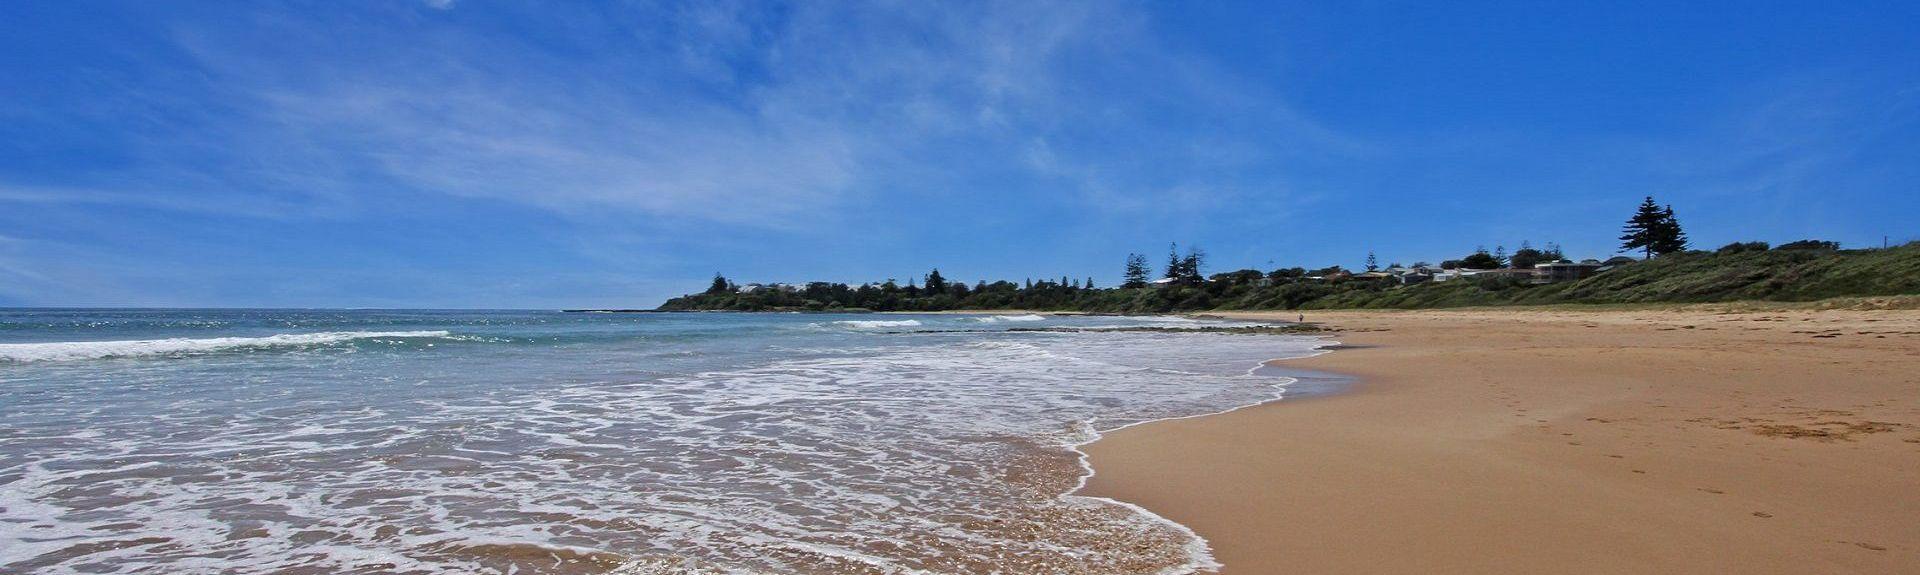 Shoalhaven Heads, Nueva Gales del Sur, Australia